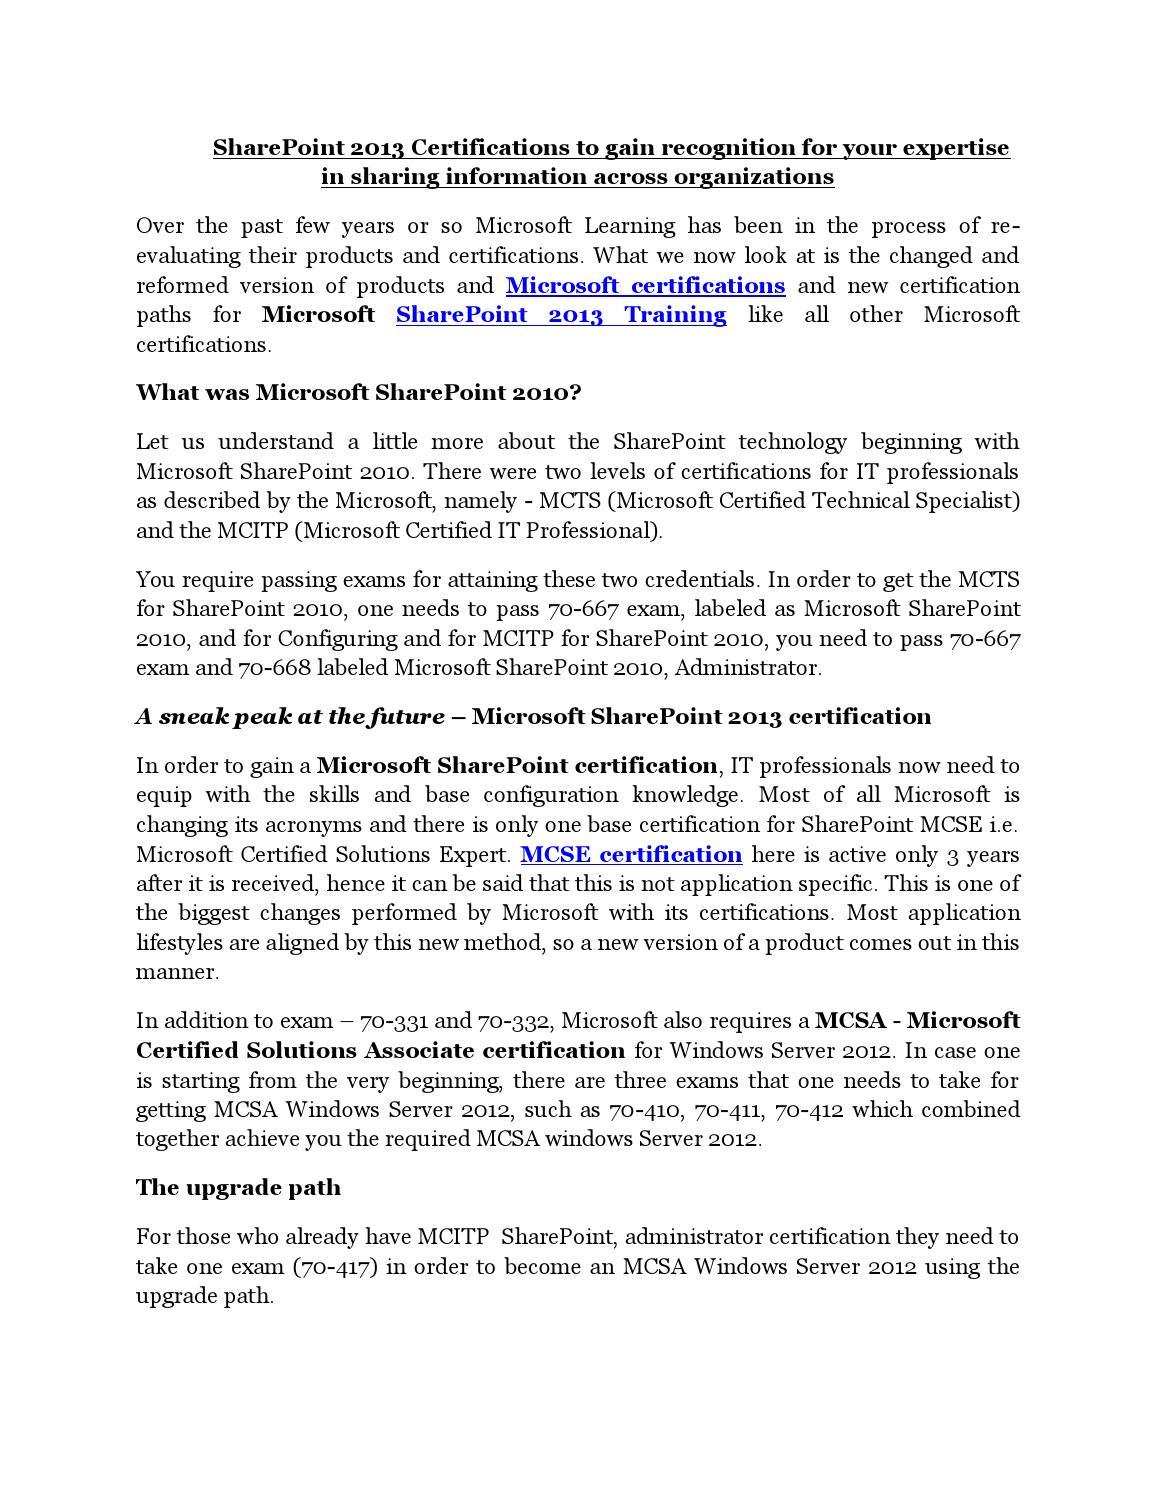 Microsoft sharepoint 2013 training and certifications pdf by microsoft sharepoint 2013 training and certifications pdf by ittraining issuu 1betcityfo Choice Image